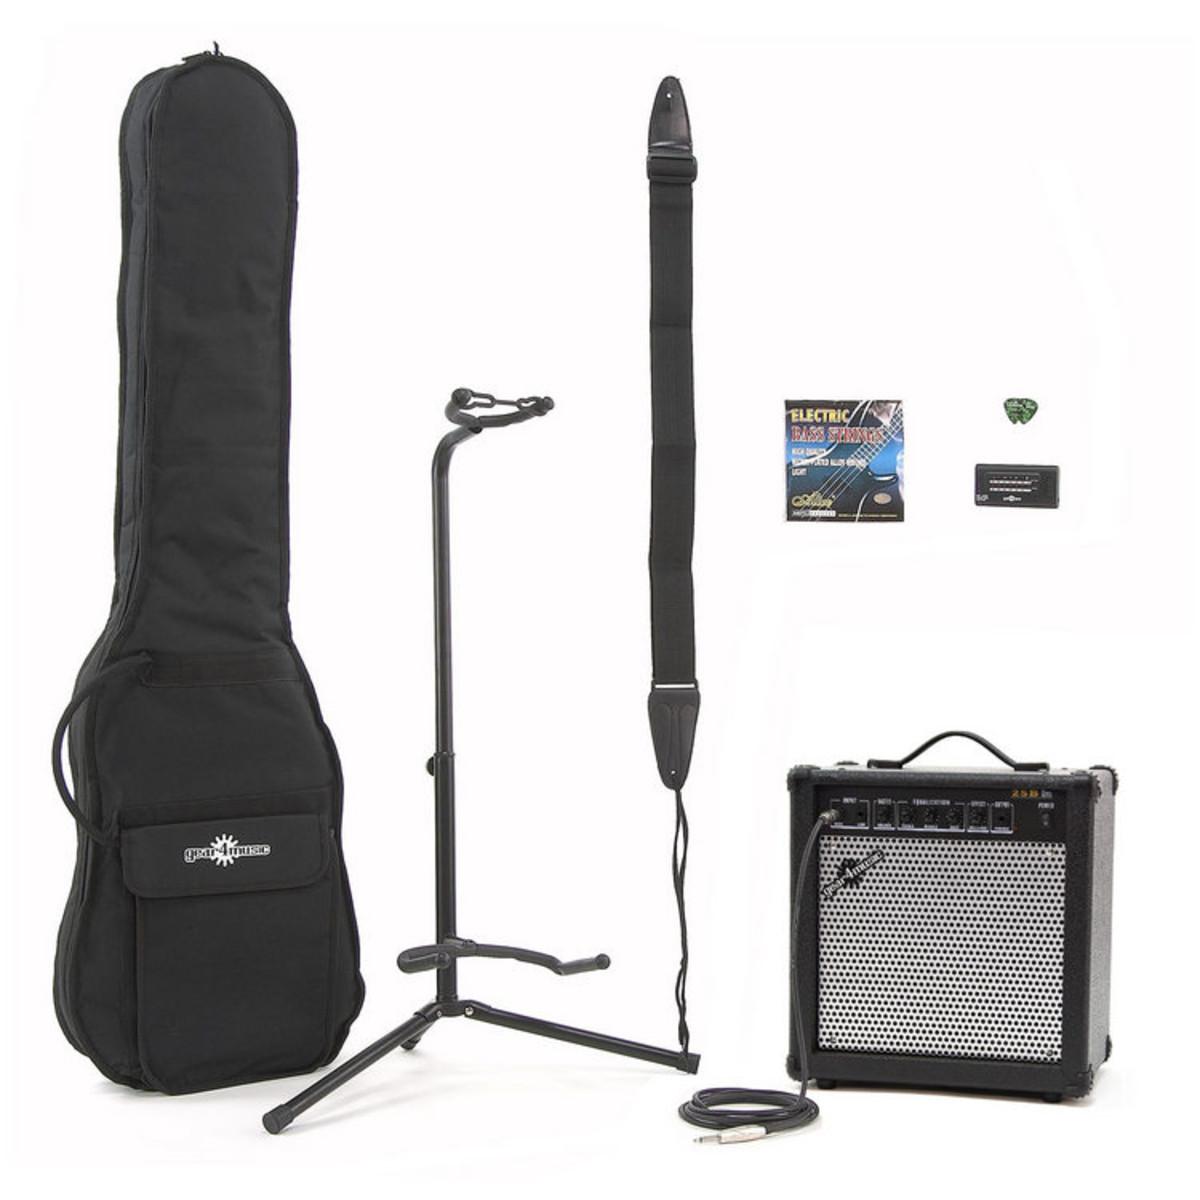 Image of 25 Watt Bass Amp & Accessory Pack